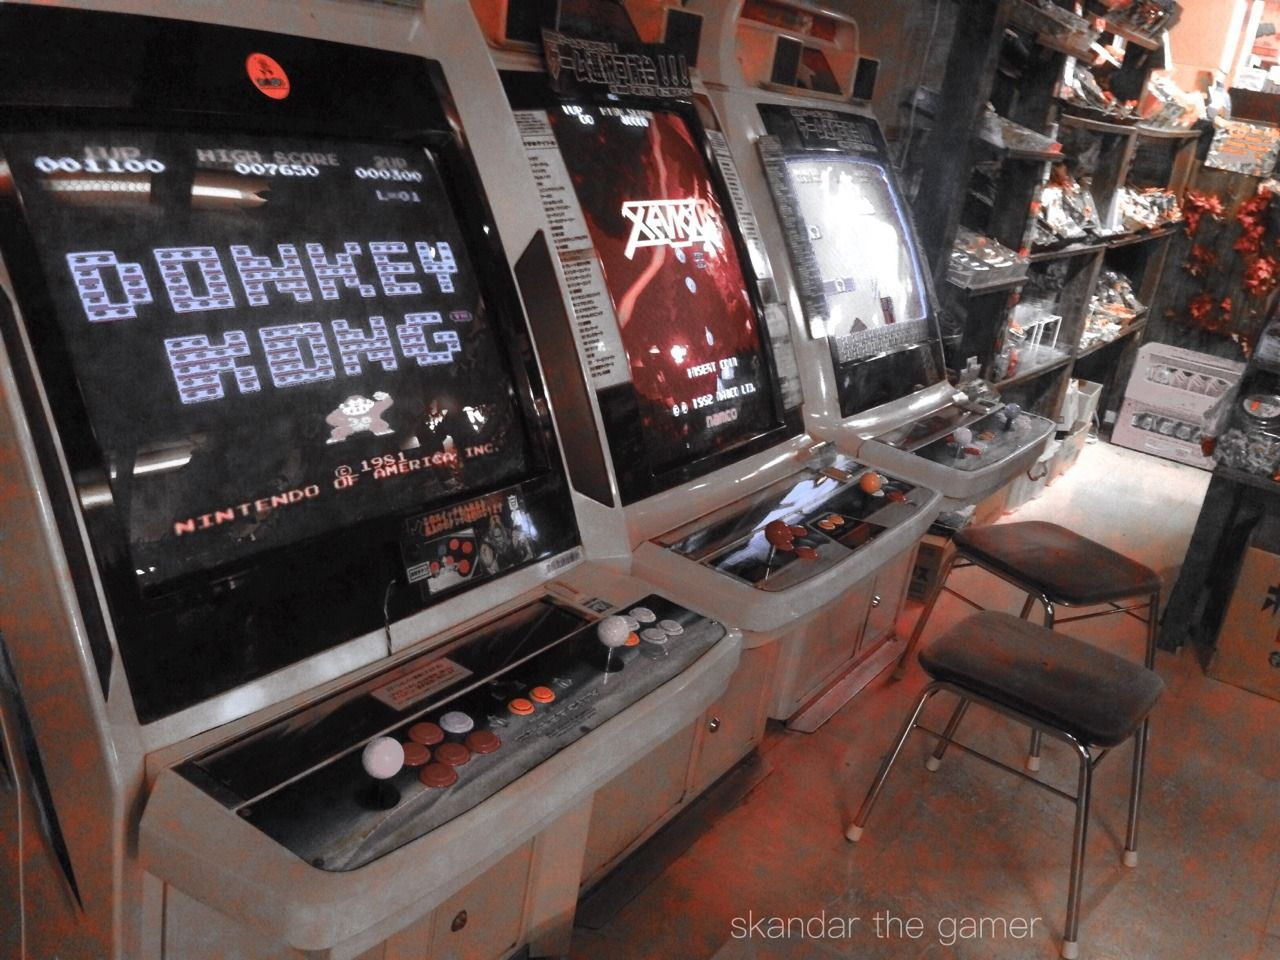 Skandar the Gamer Arcade bar, Video game music, Arcade